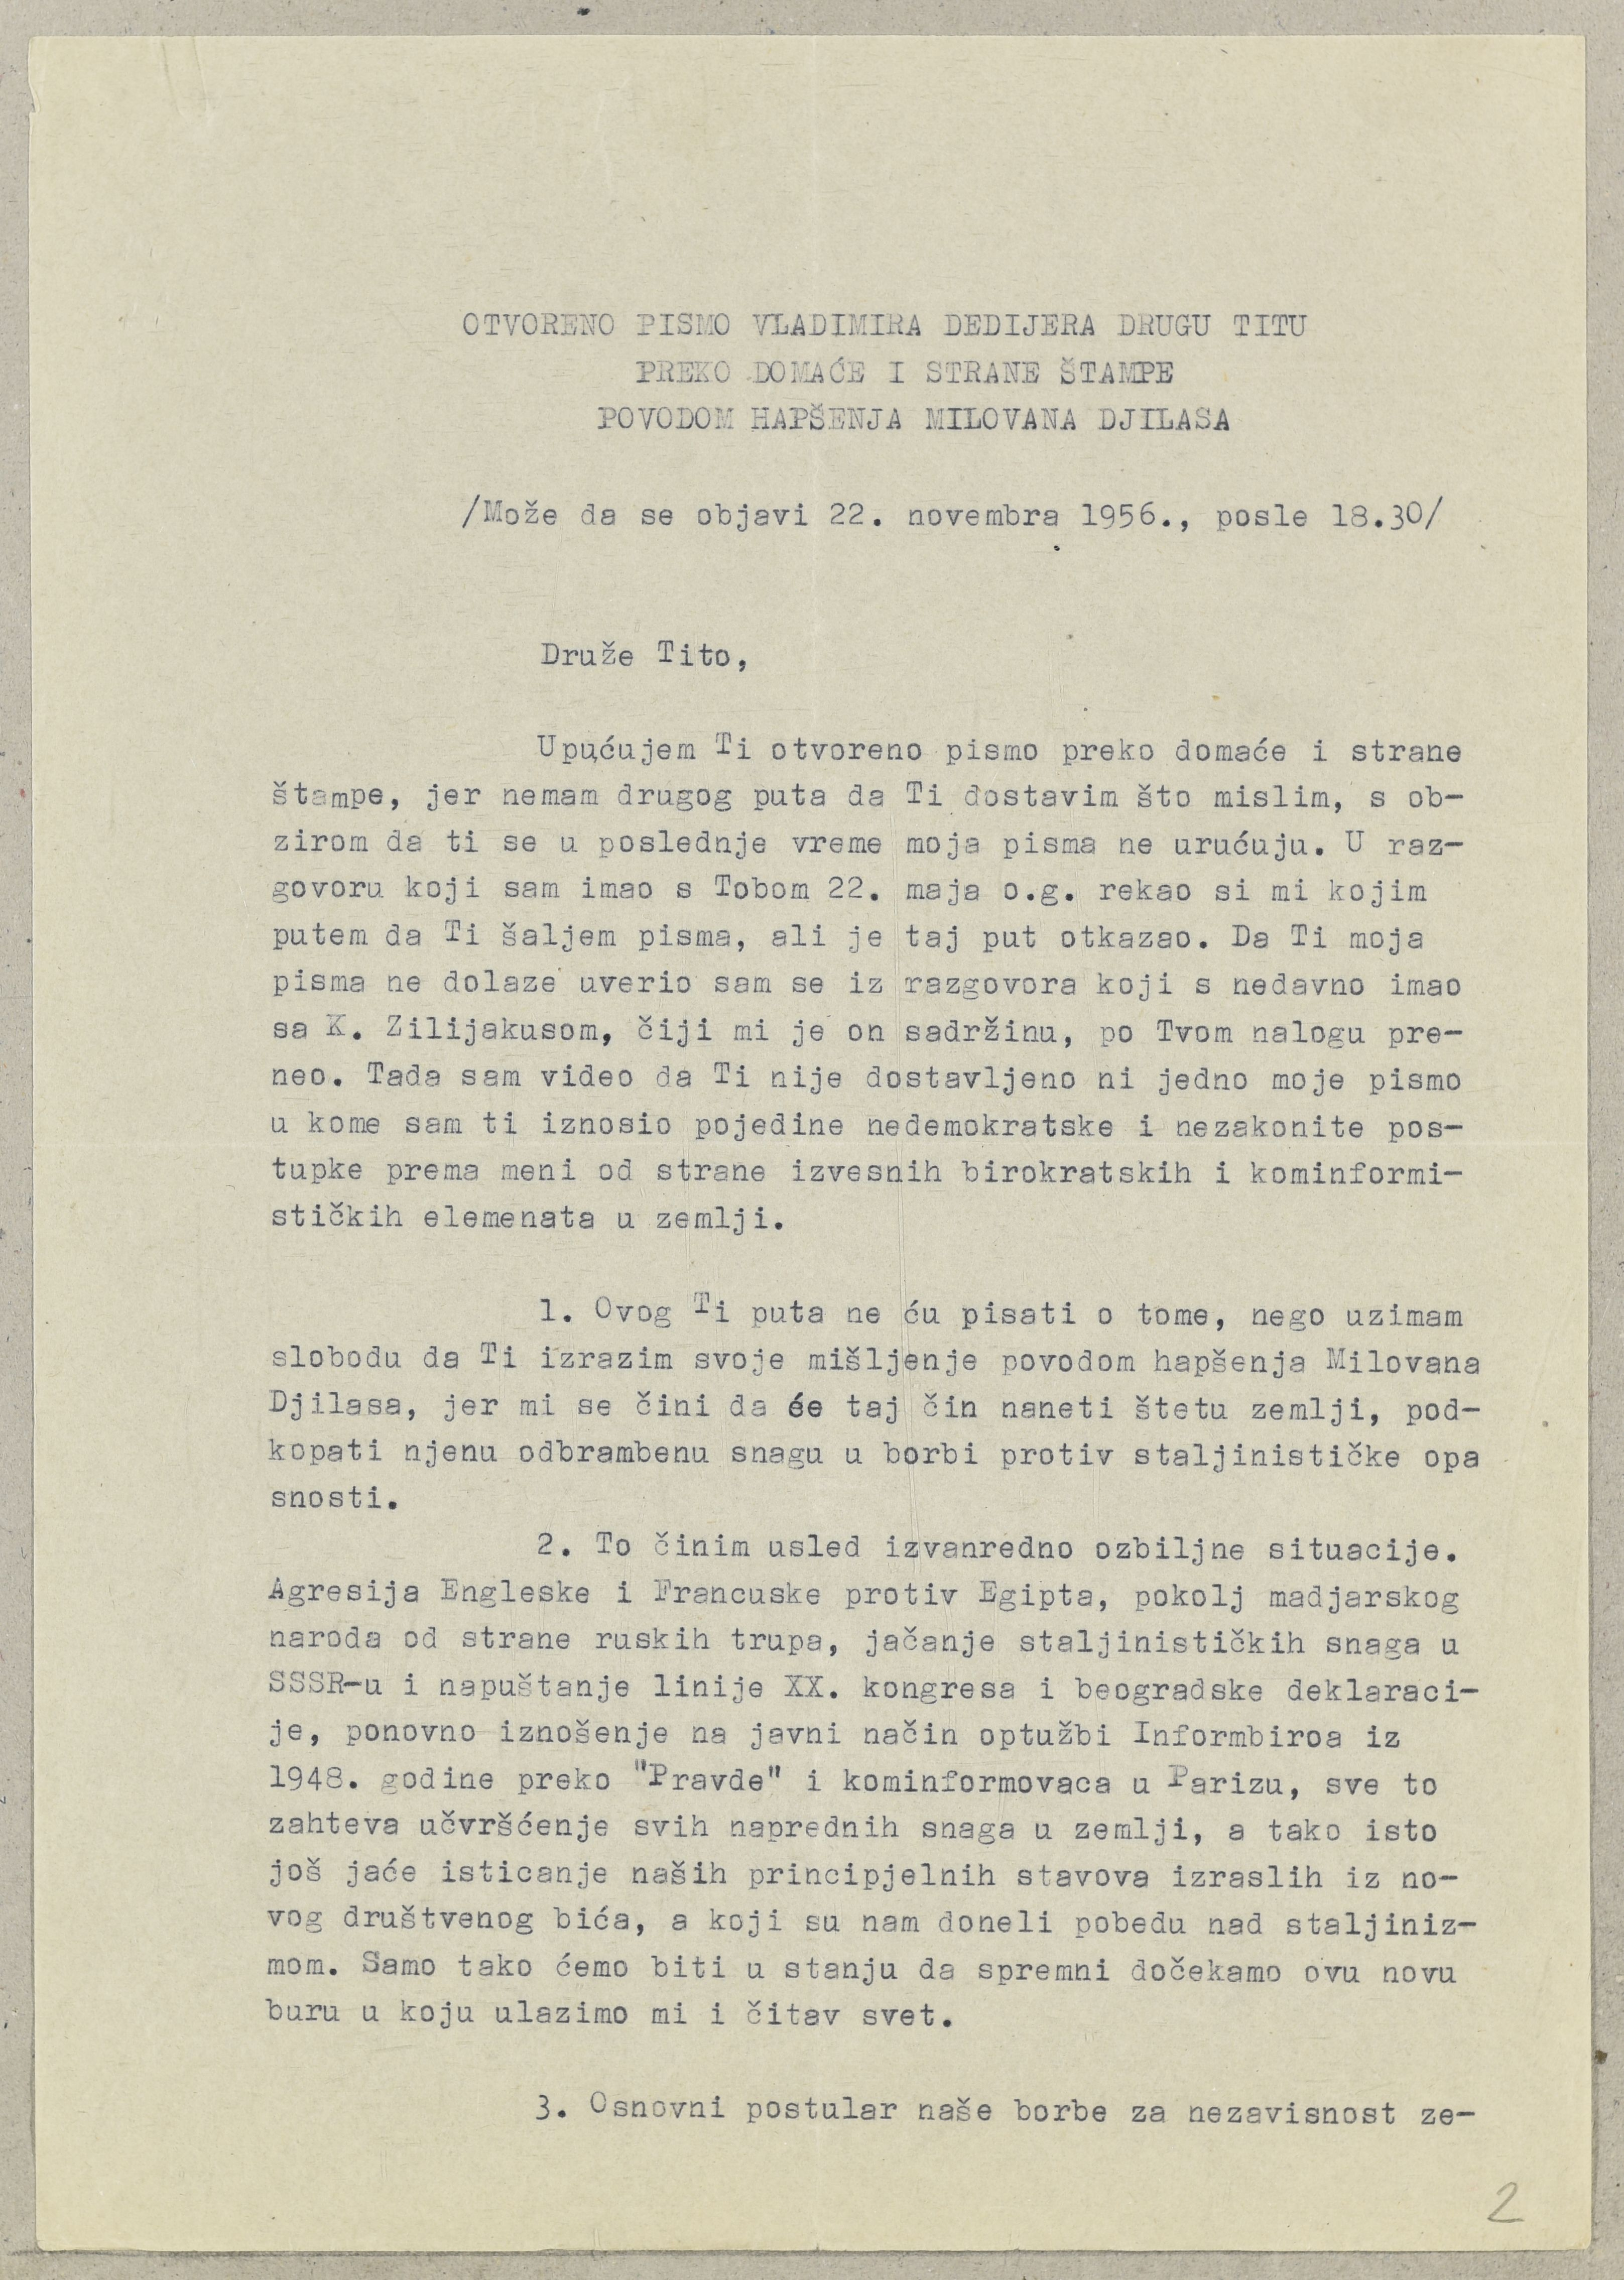 Vladimir Dedijer's open letter to Josip Broz Tito on the arrest of Milovan Djilas. 1956. Archival document